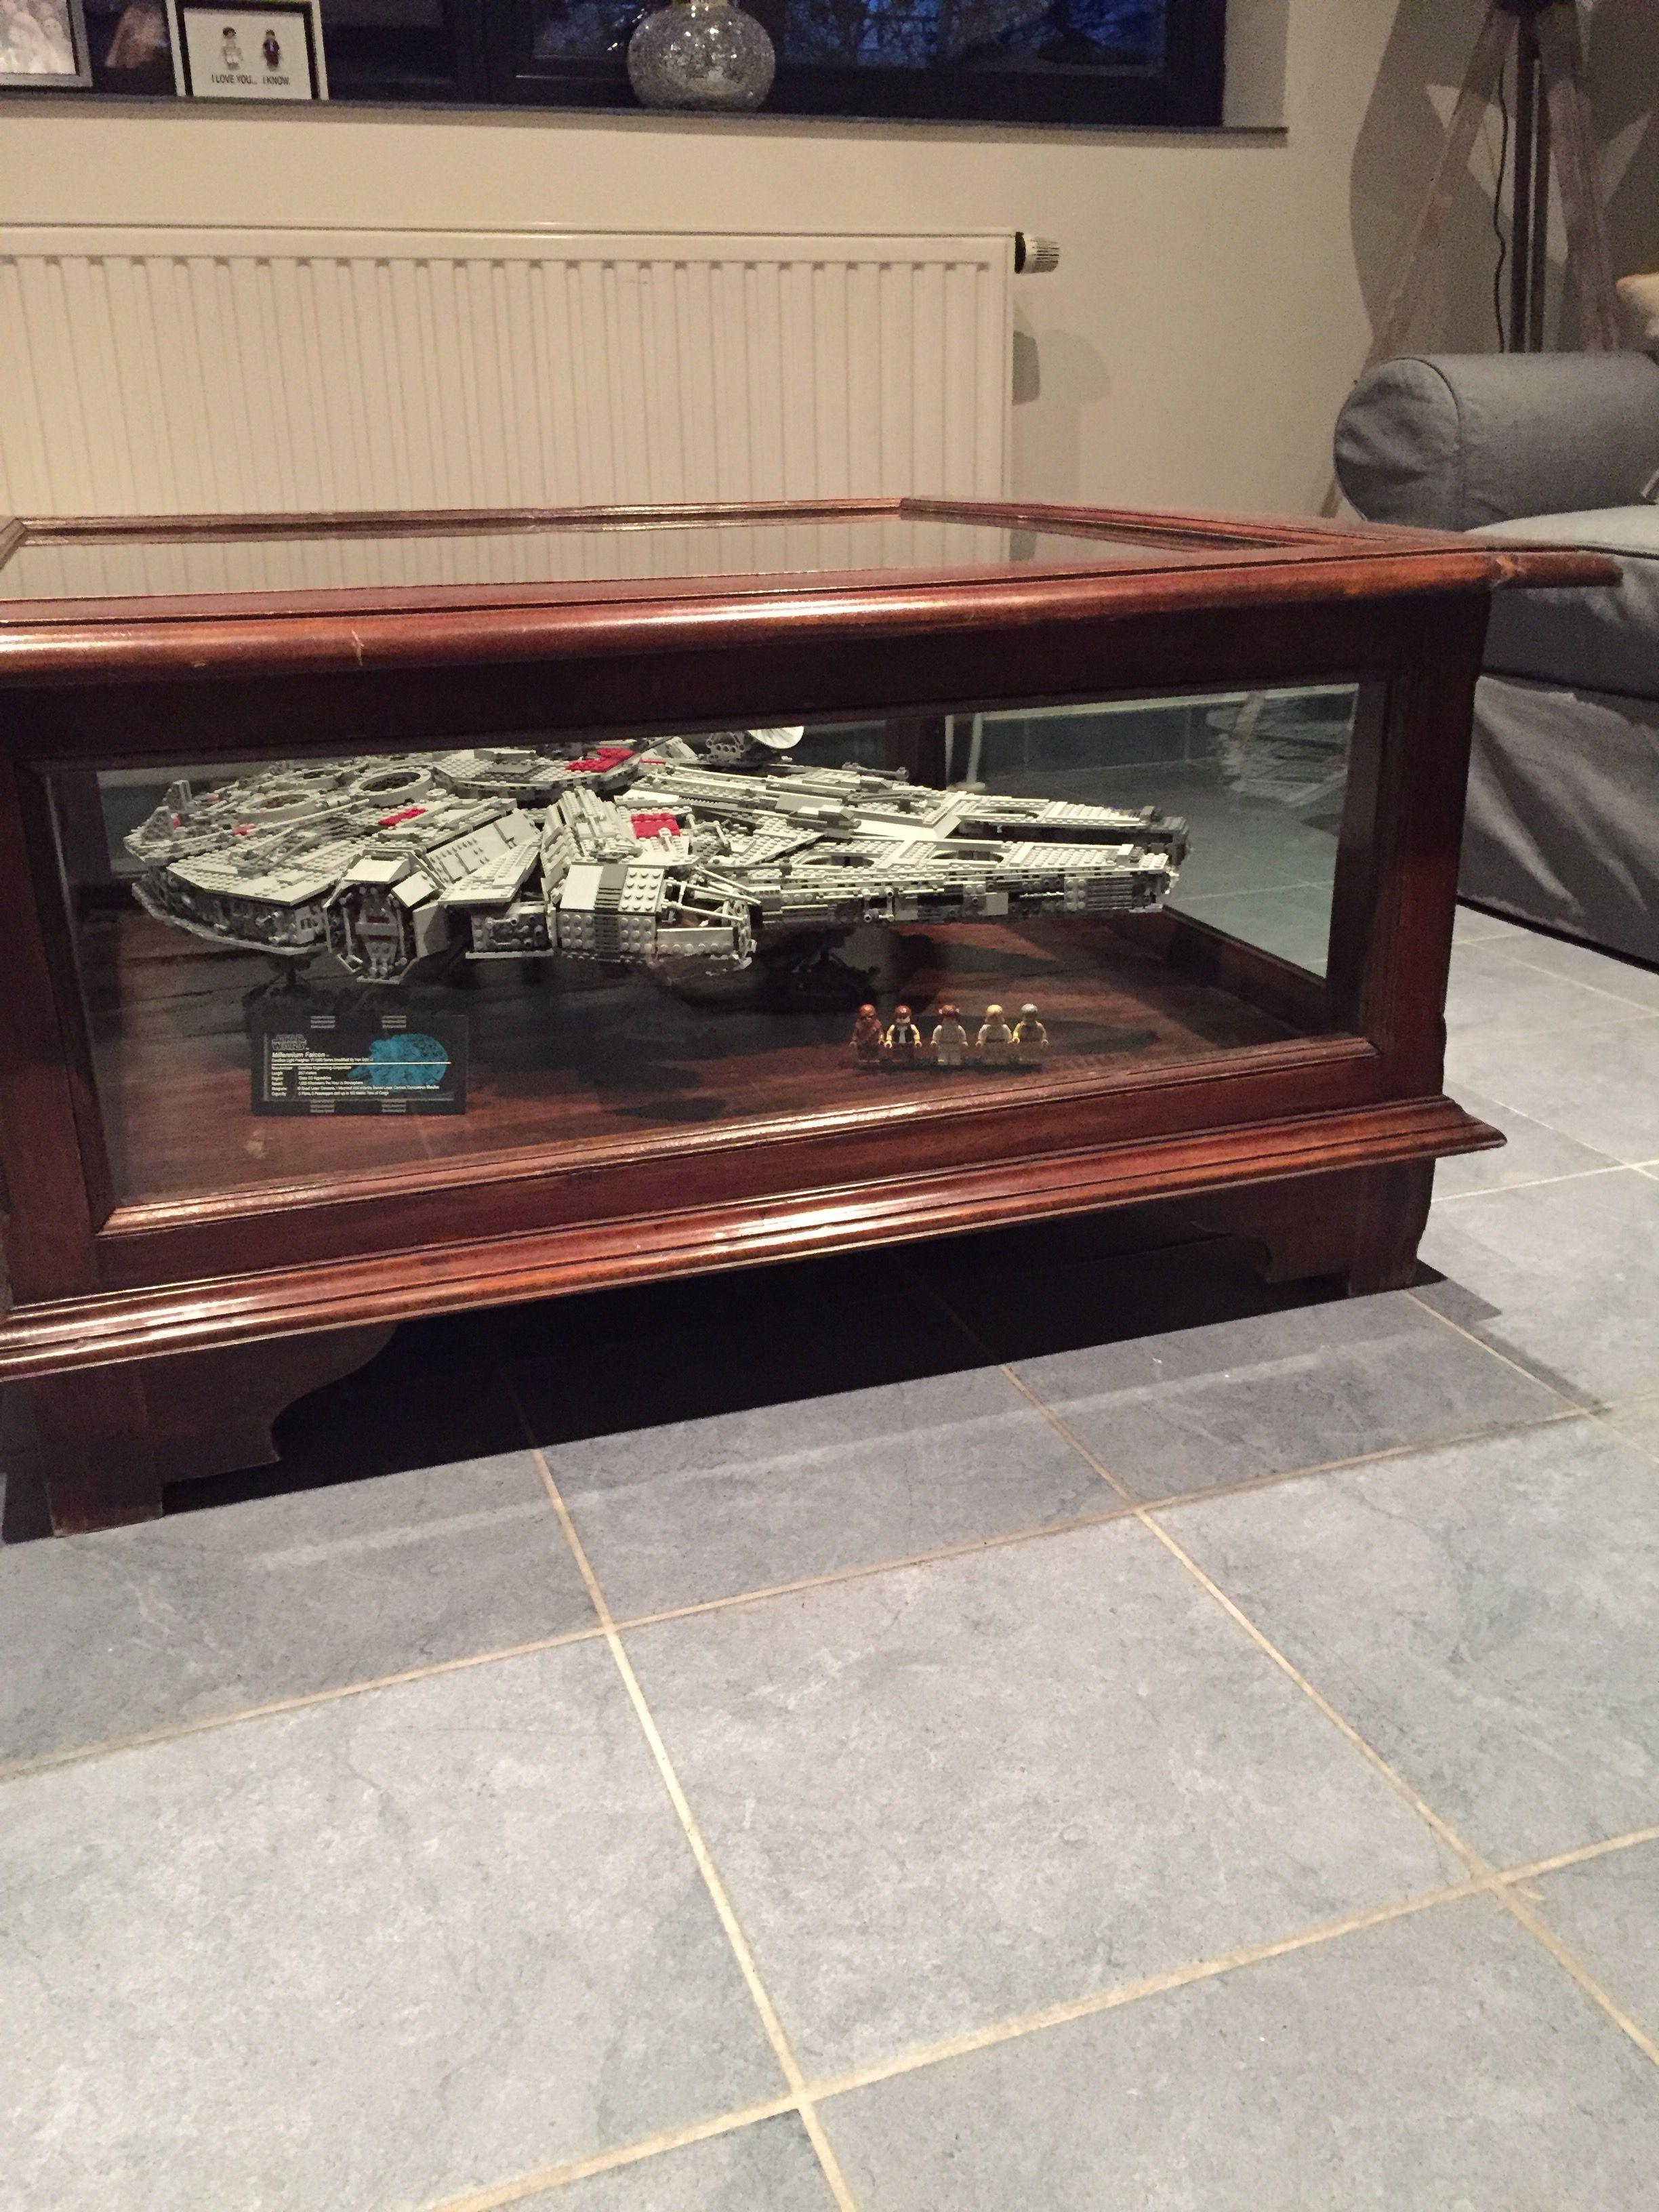 Lego Mellnium Falcon Star Wars Decor Star Wars Room Star Wars Diy [ 3264 x 2448 Pixel ]